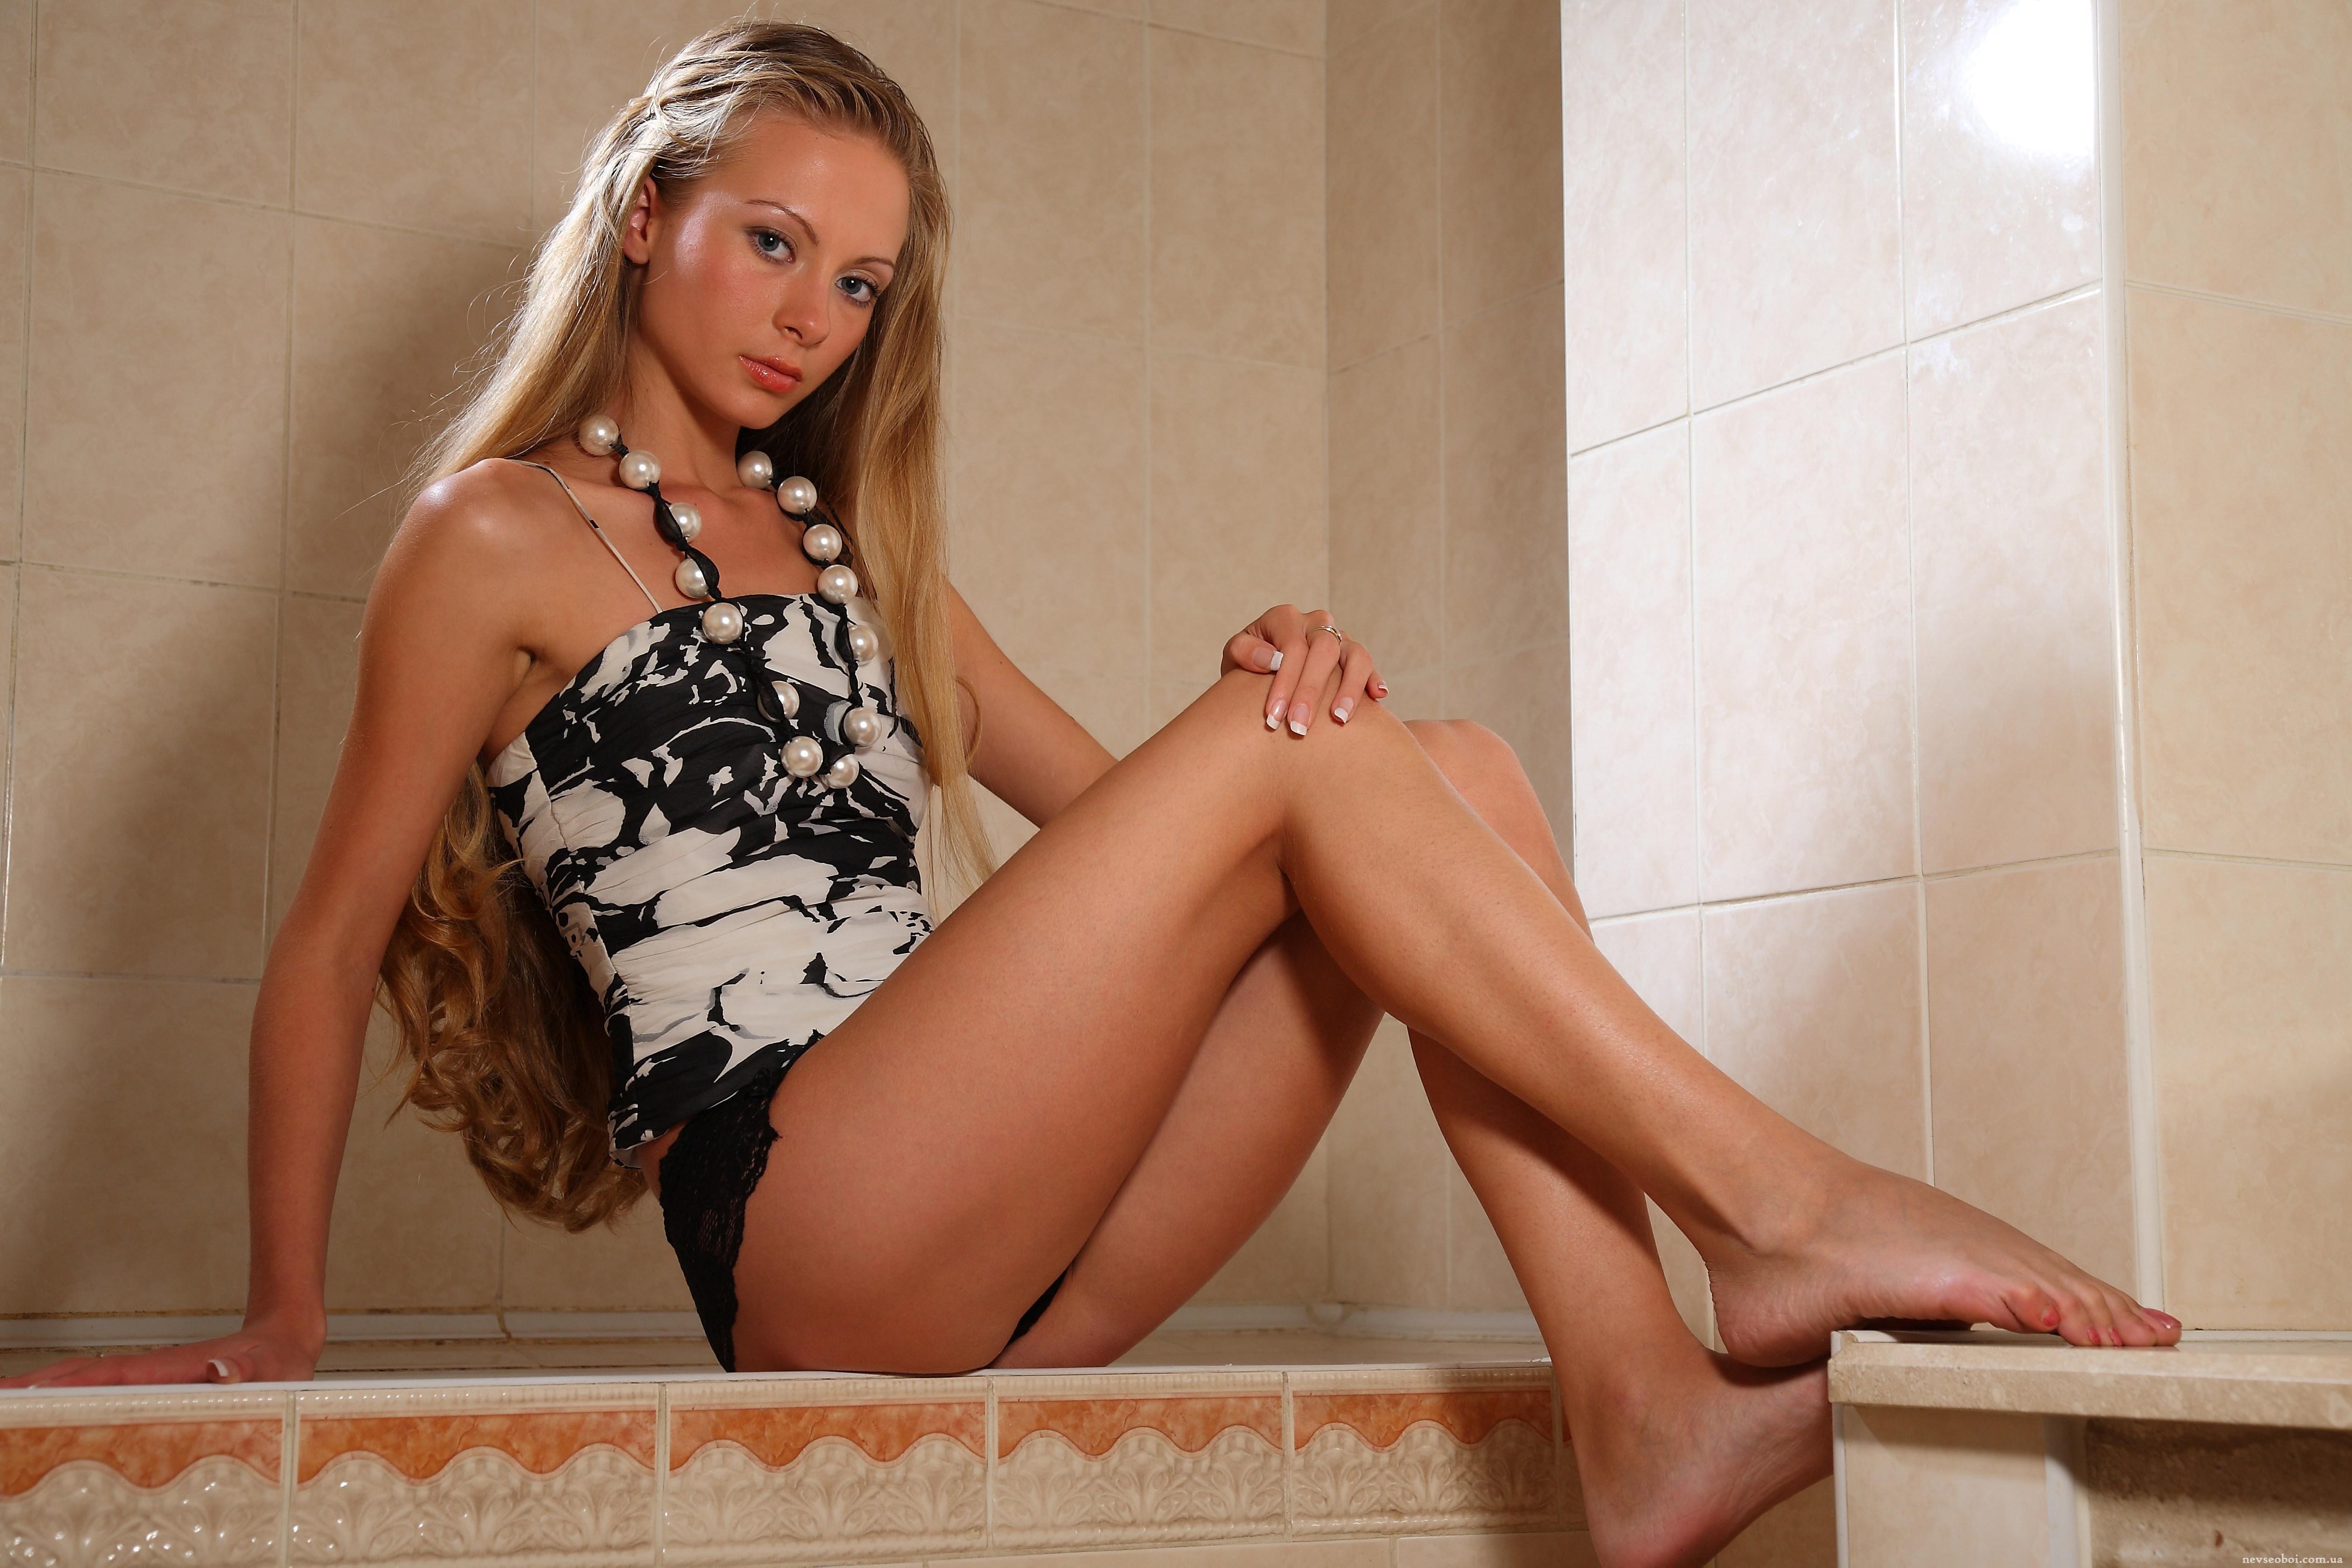 Брюнетка раздвинула волосатую киску в ванной  545281